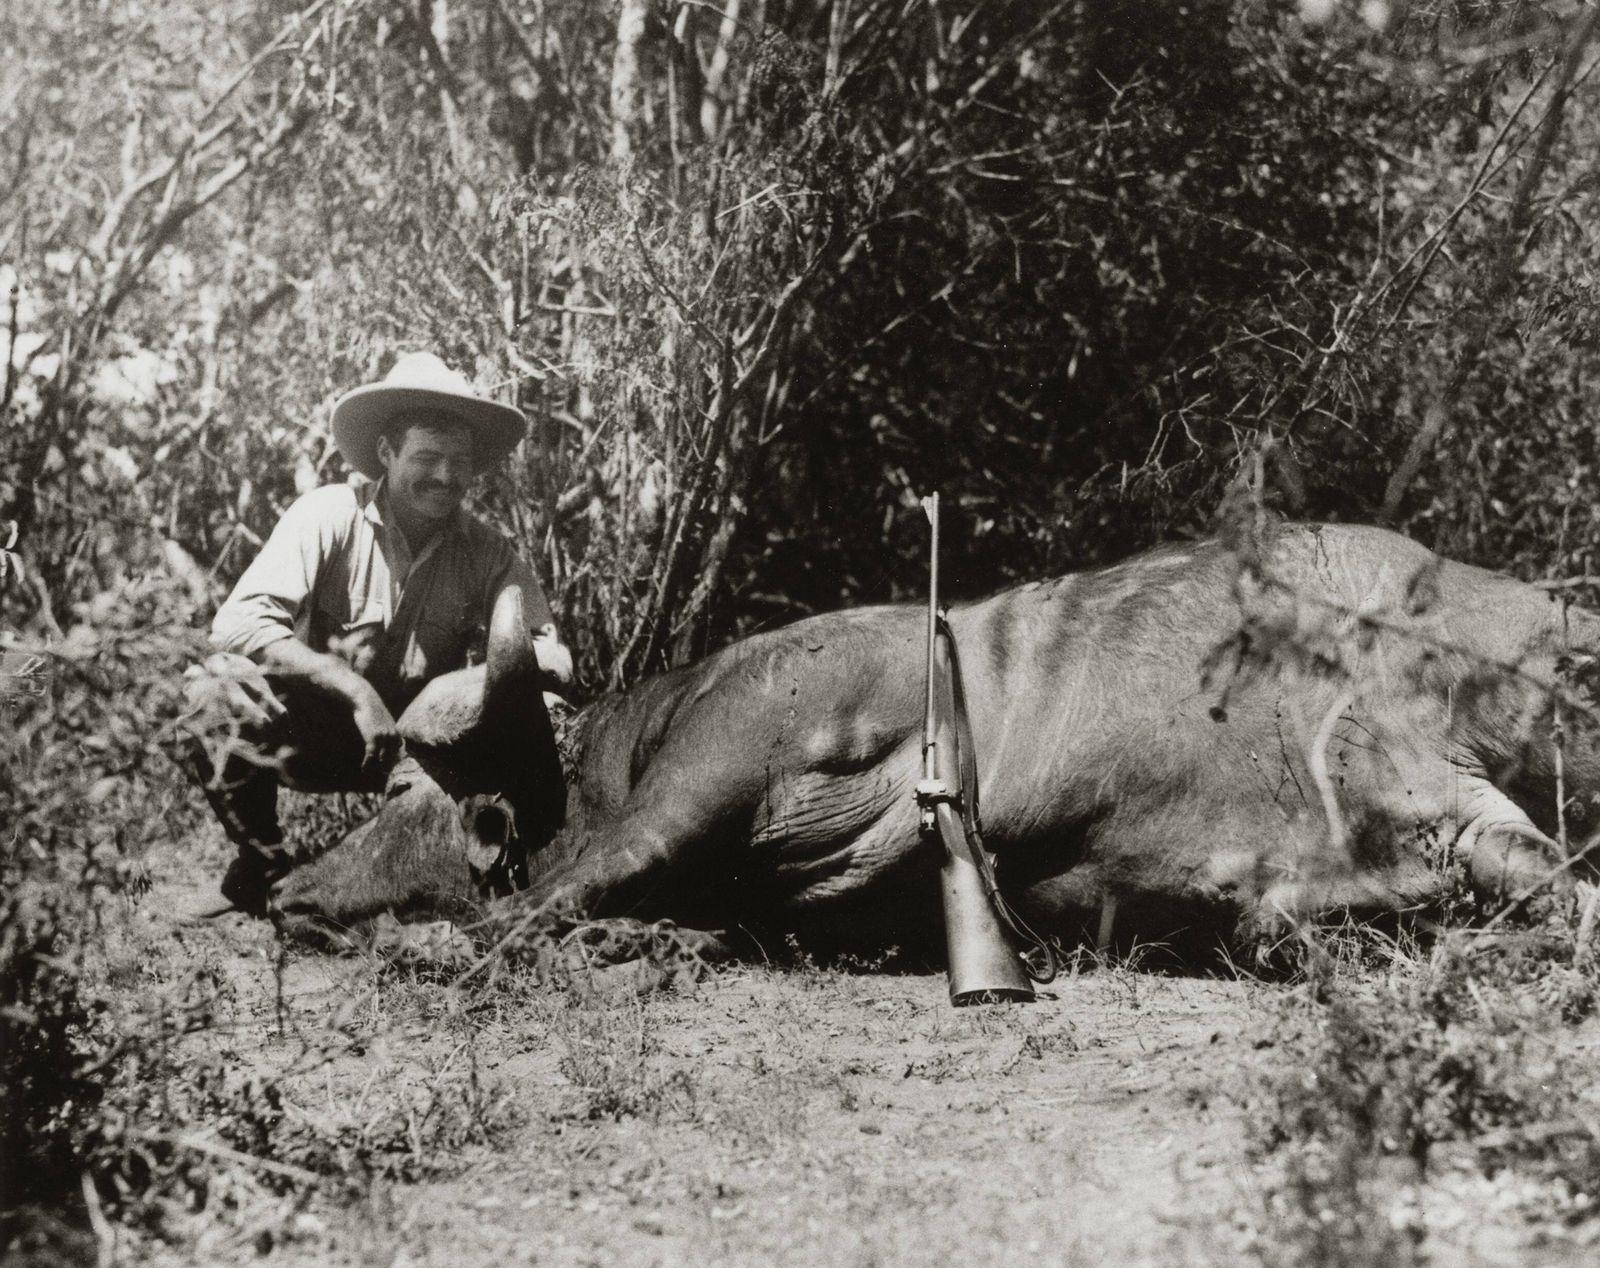 Ernest Hemingway on Safari in Africa circa 1933 1934 PUBLICATIONxINxGERxSUIxAUTxONLY Copyright xNAR